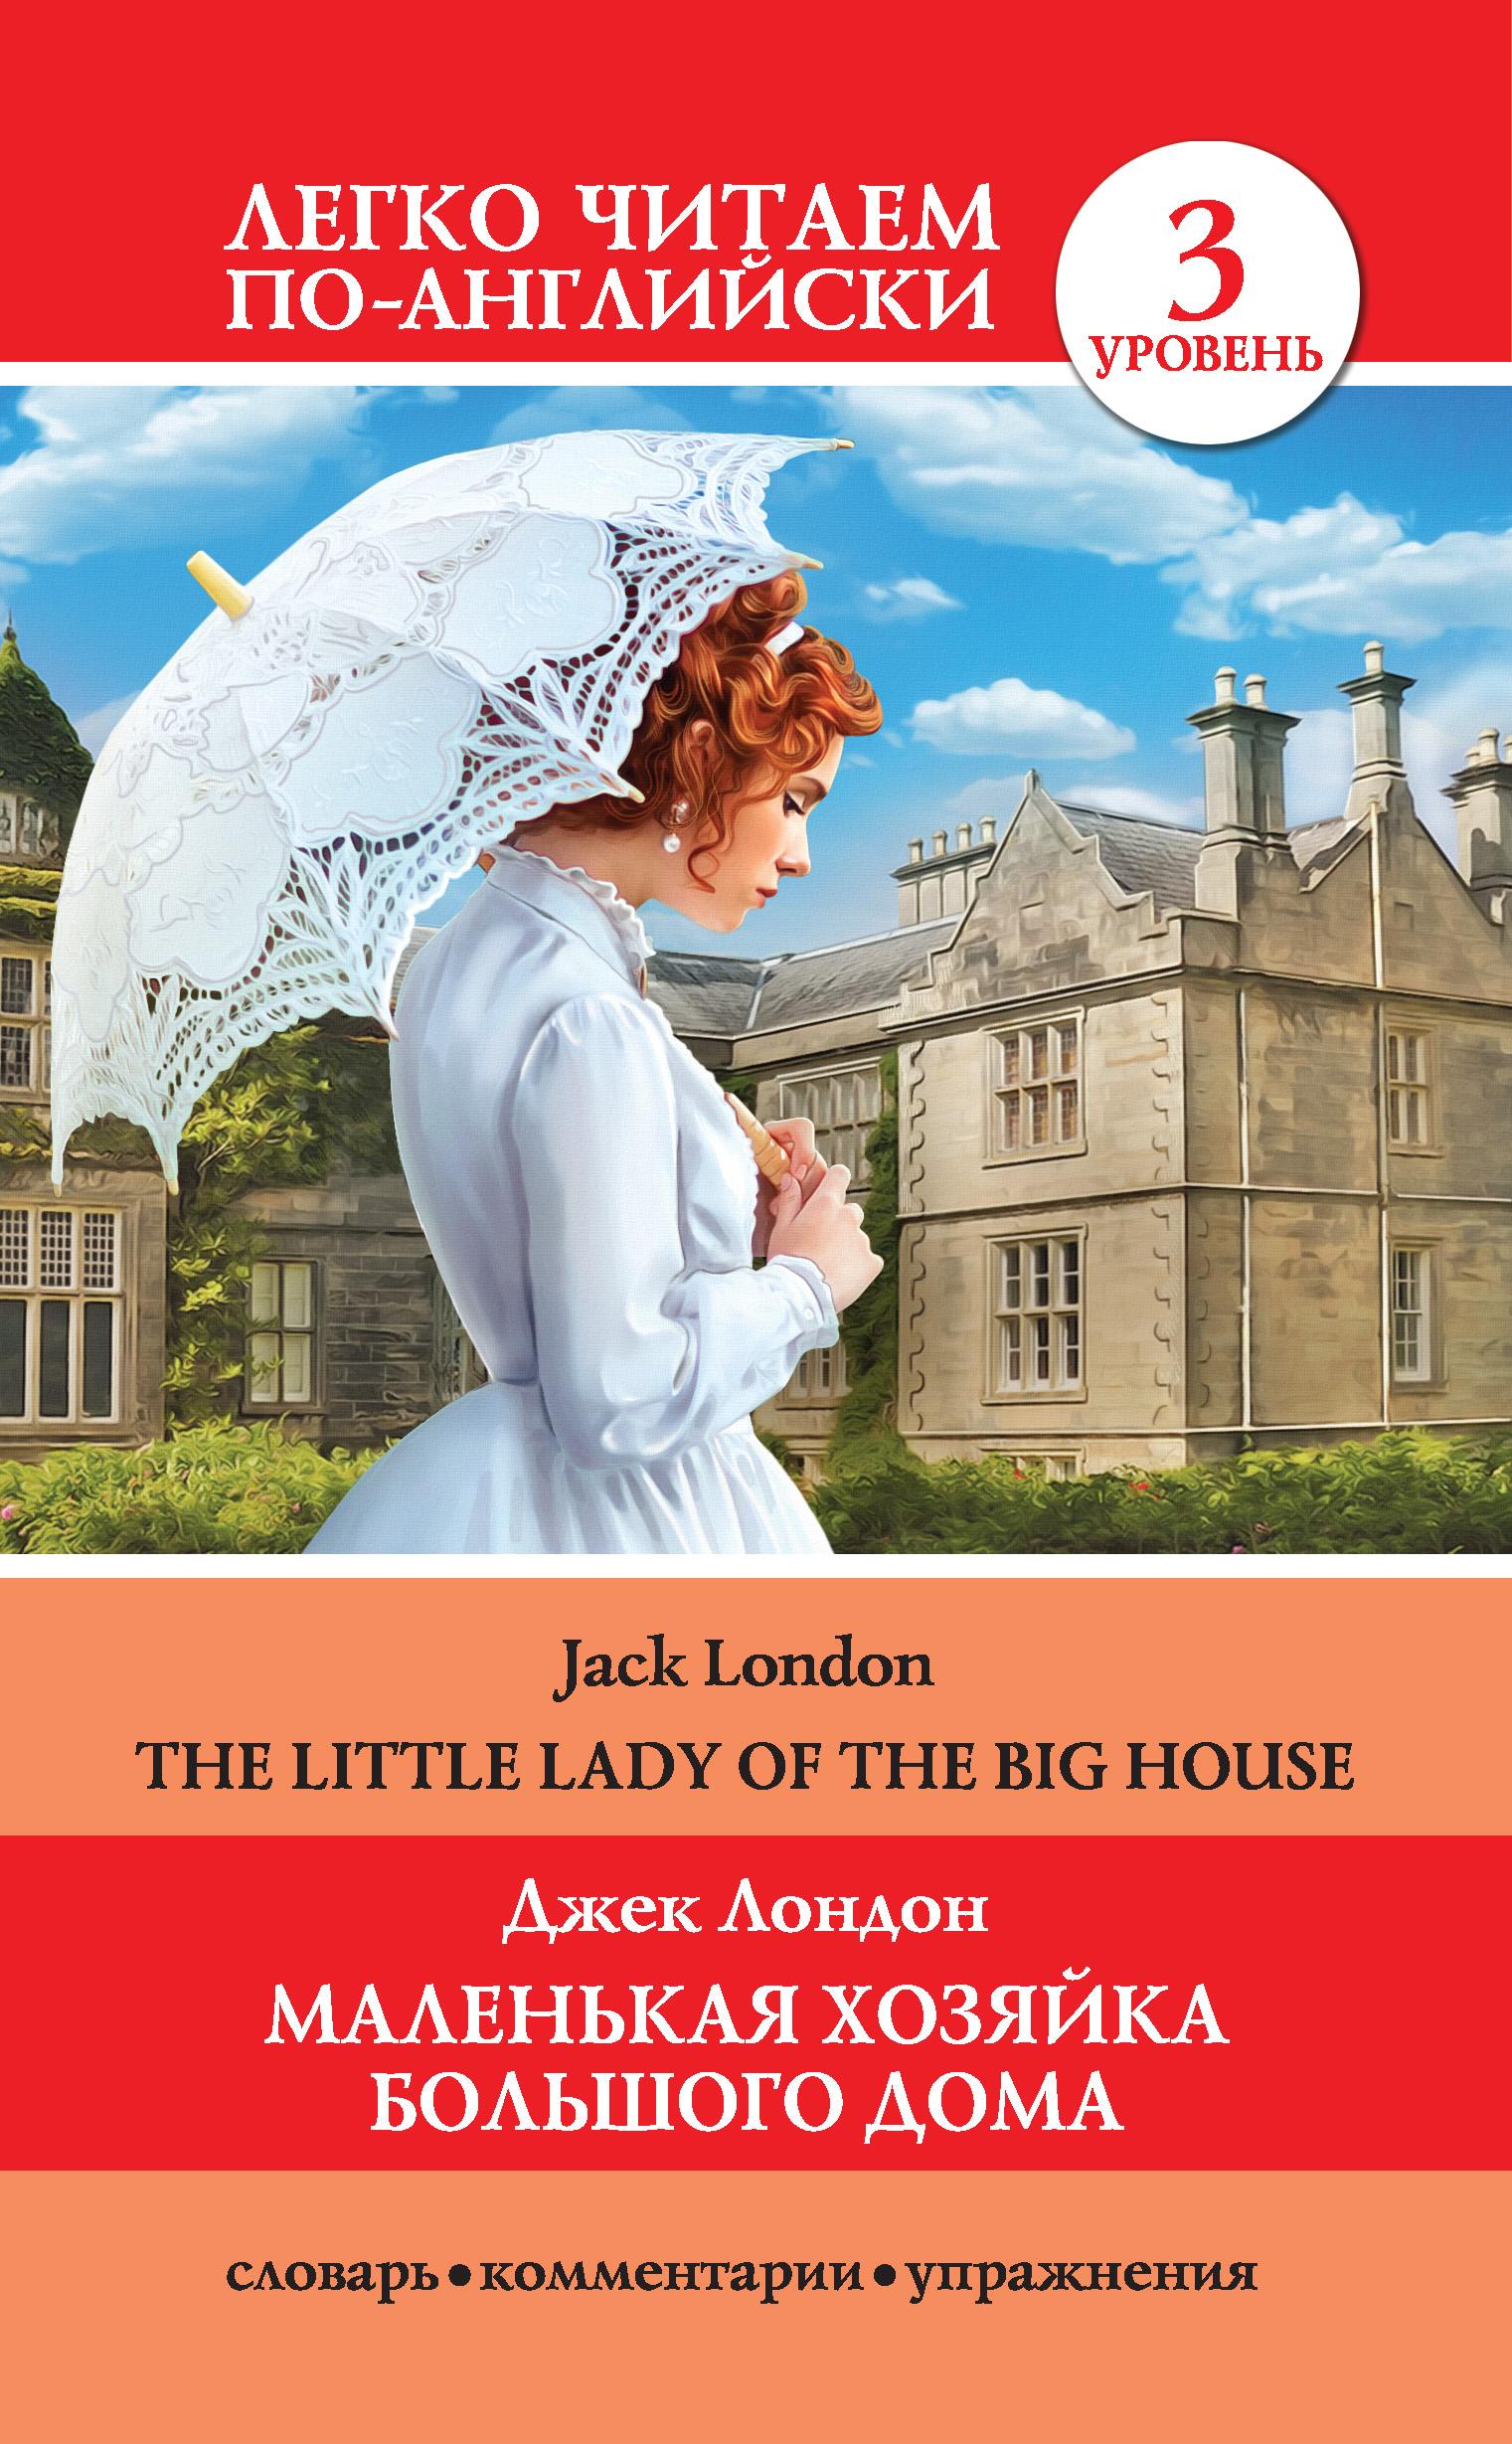 Джек Лондон Маленькая хозяйка большого дома / The Little Lady Of The Big House лондон дж the little lady of the big house маленькая хозяйка большого дома